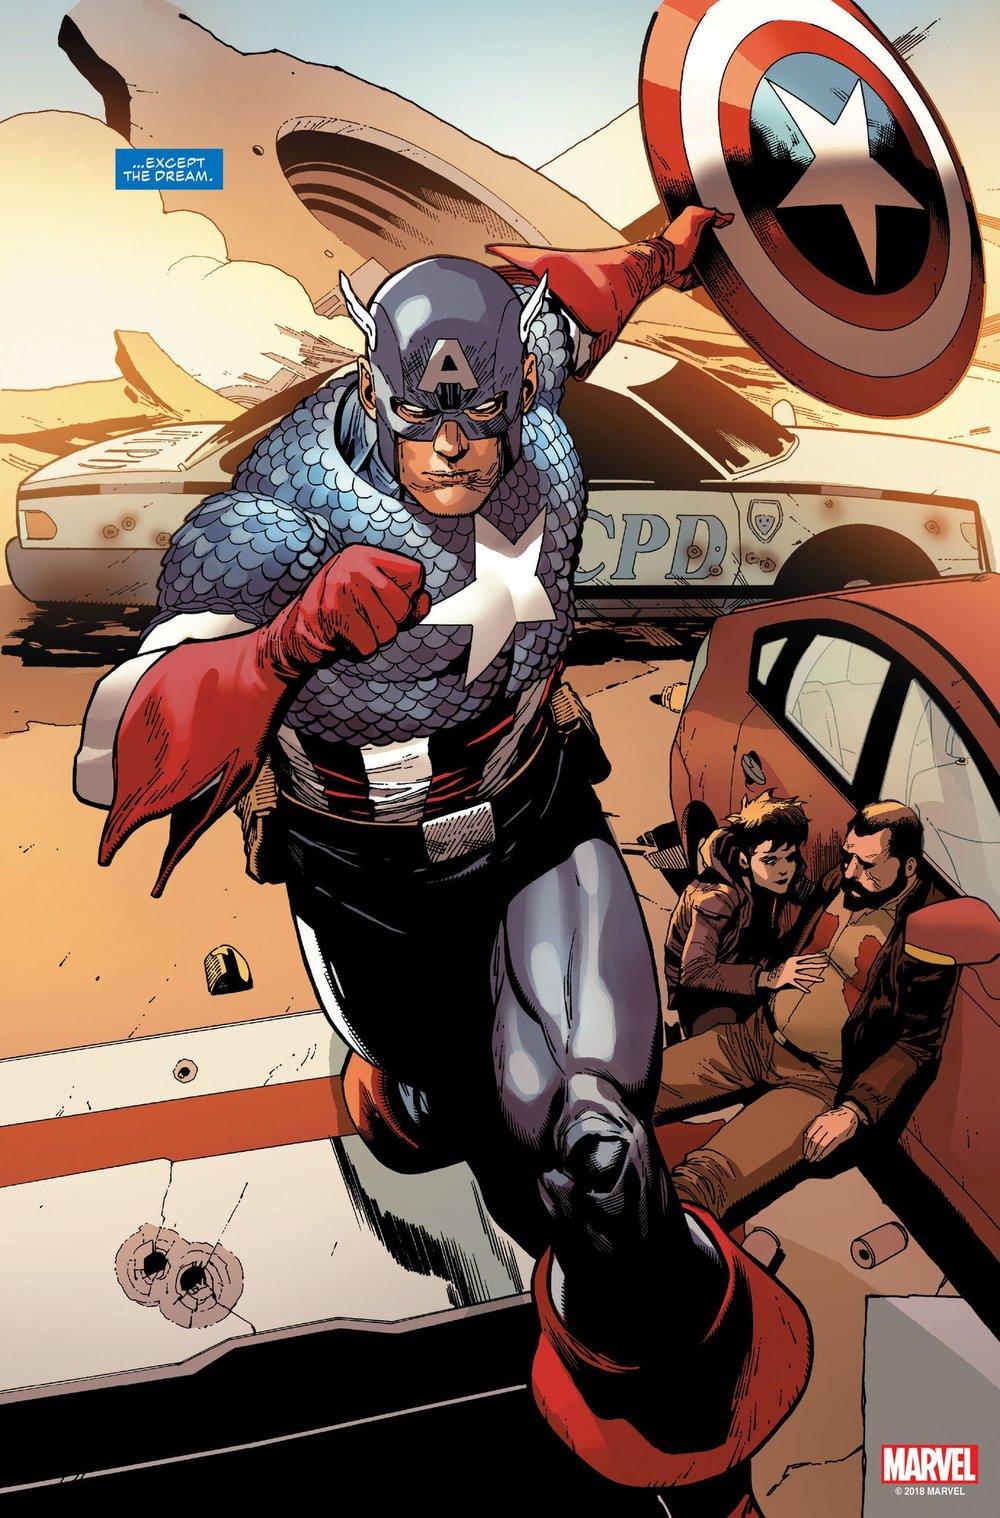 Coates_Leinil Yu Captain America 1.jpeg